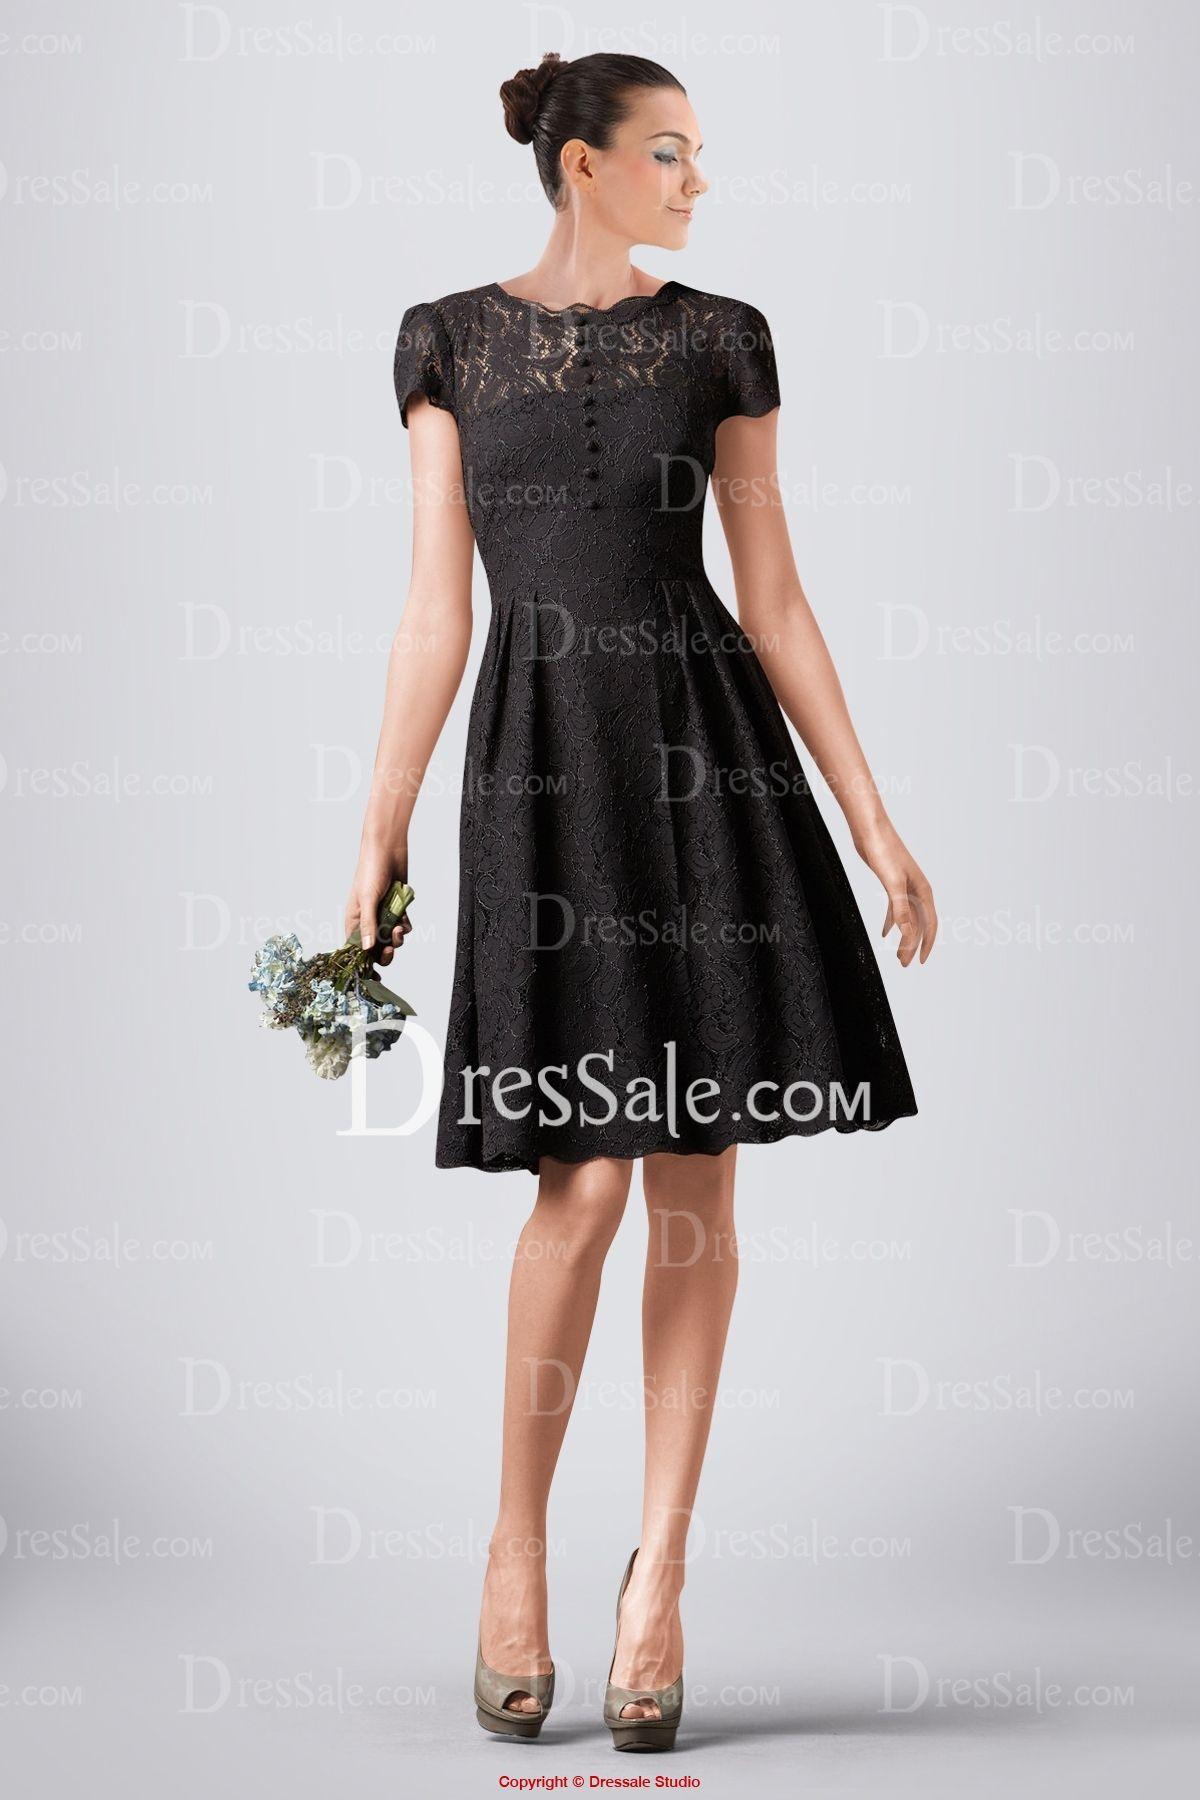 Exquisite black lace bridesmaid dress featuring vback design